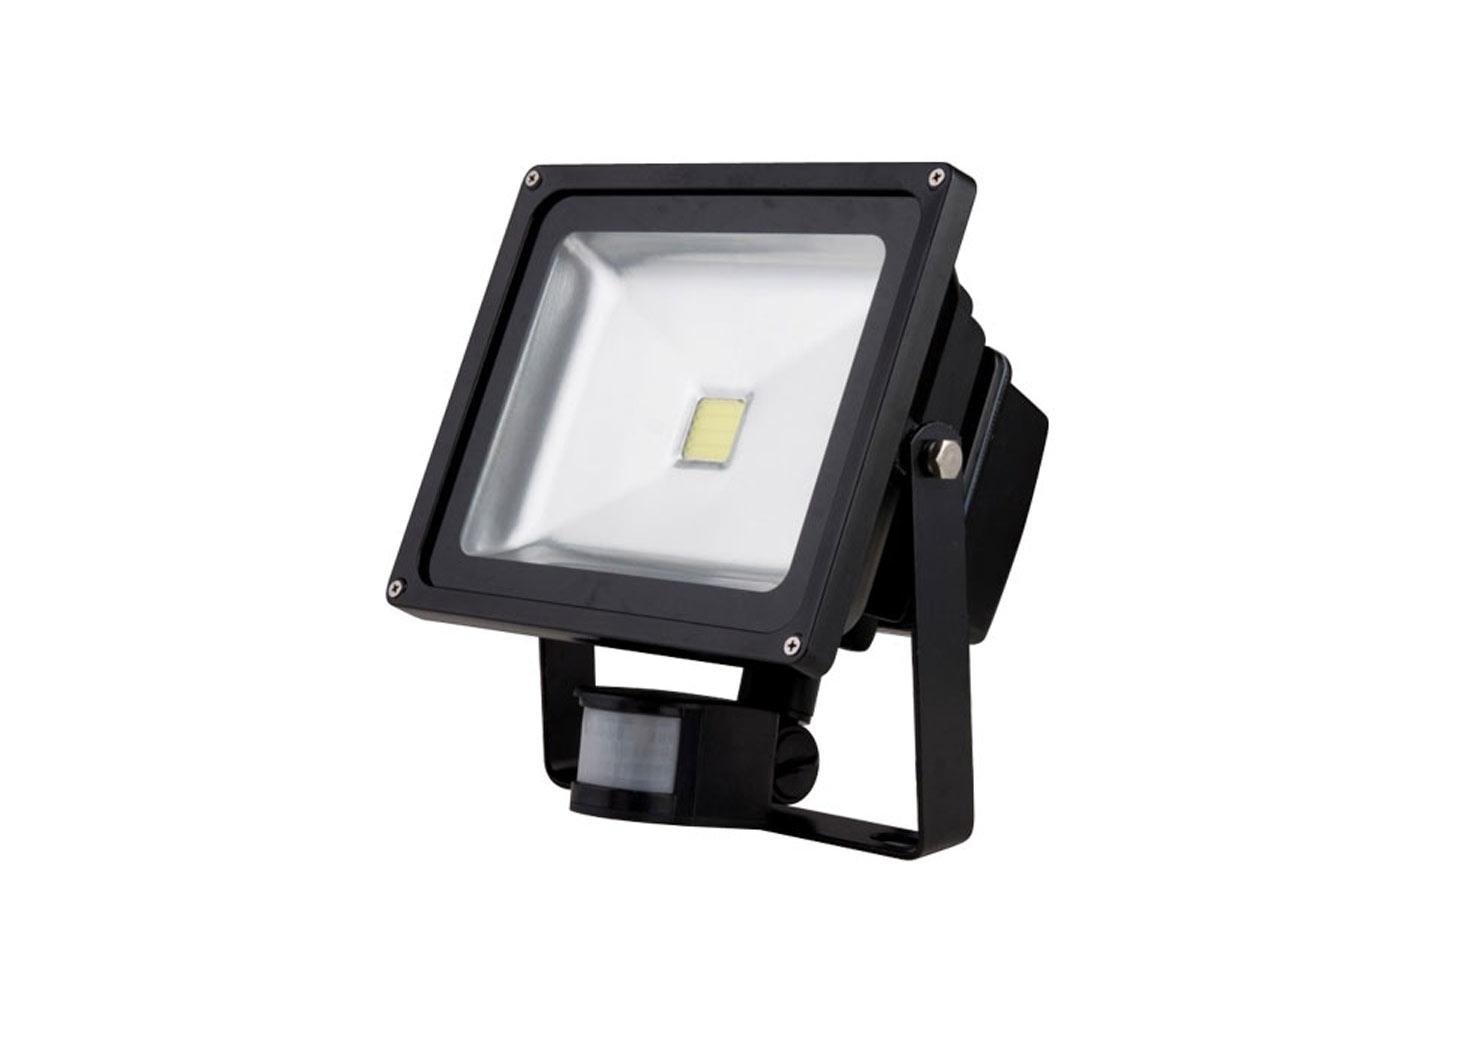 50W LED FLOODLIGHT WITH PIR SENSOR COOL WHITE 6000K LIGHT OUTPUT IP65  (UKE 50WLEDFLOOD PIR) By Www.ukew.co.uk